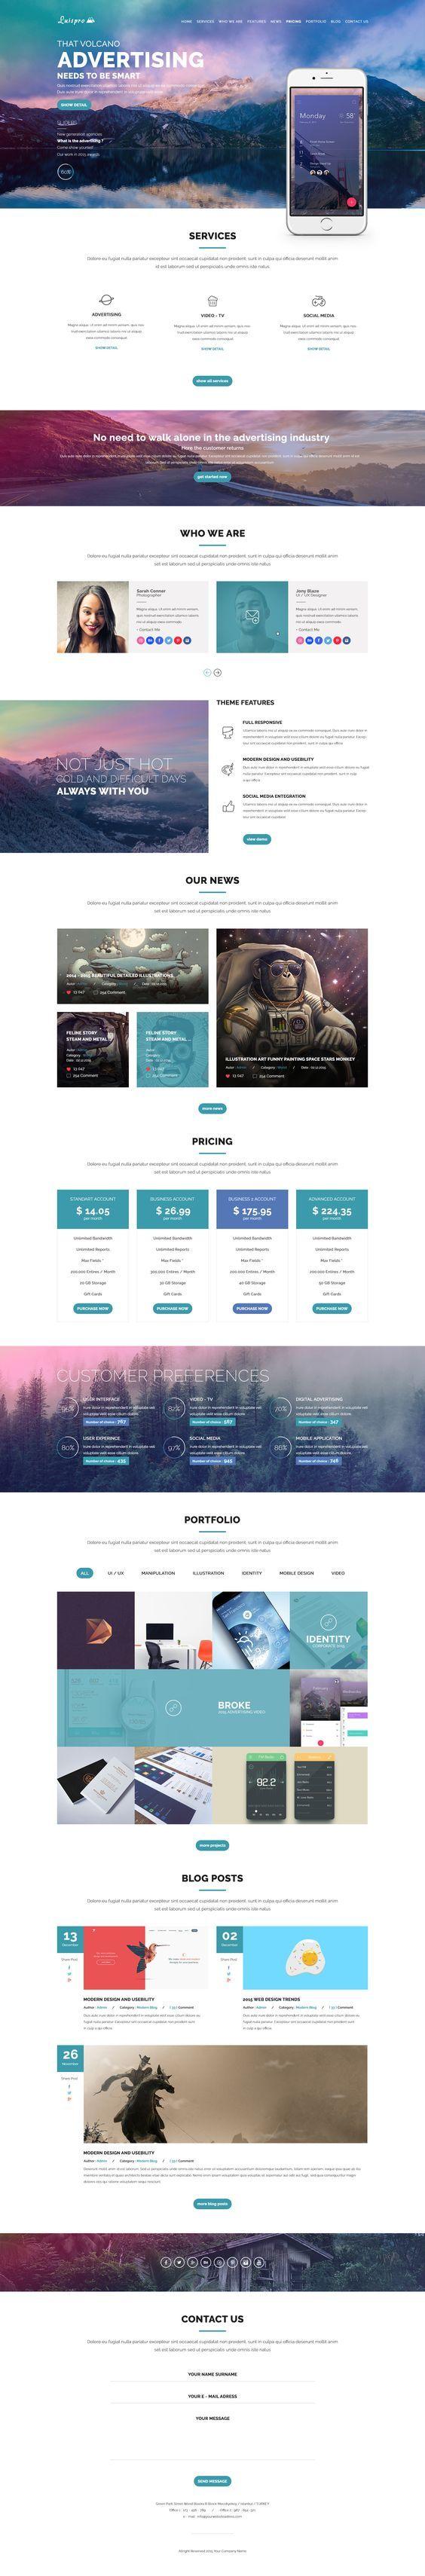 Luispro - Flat & User Friendly Landing Page Design: